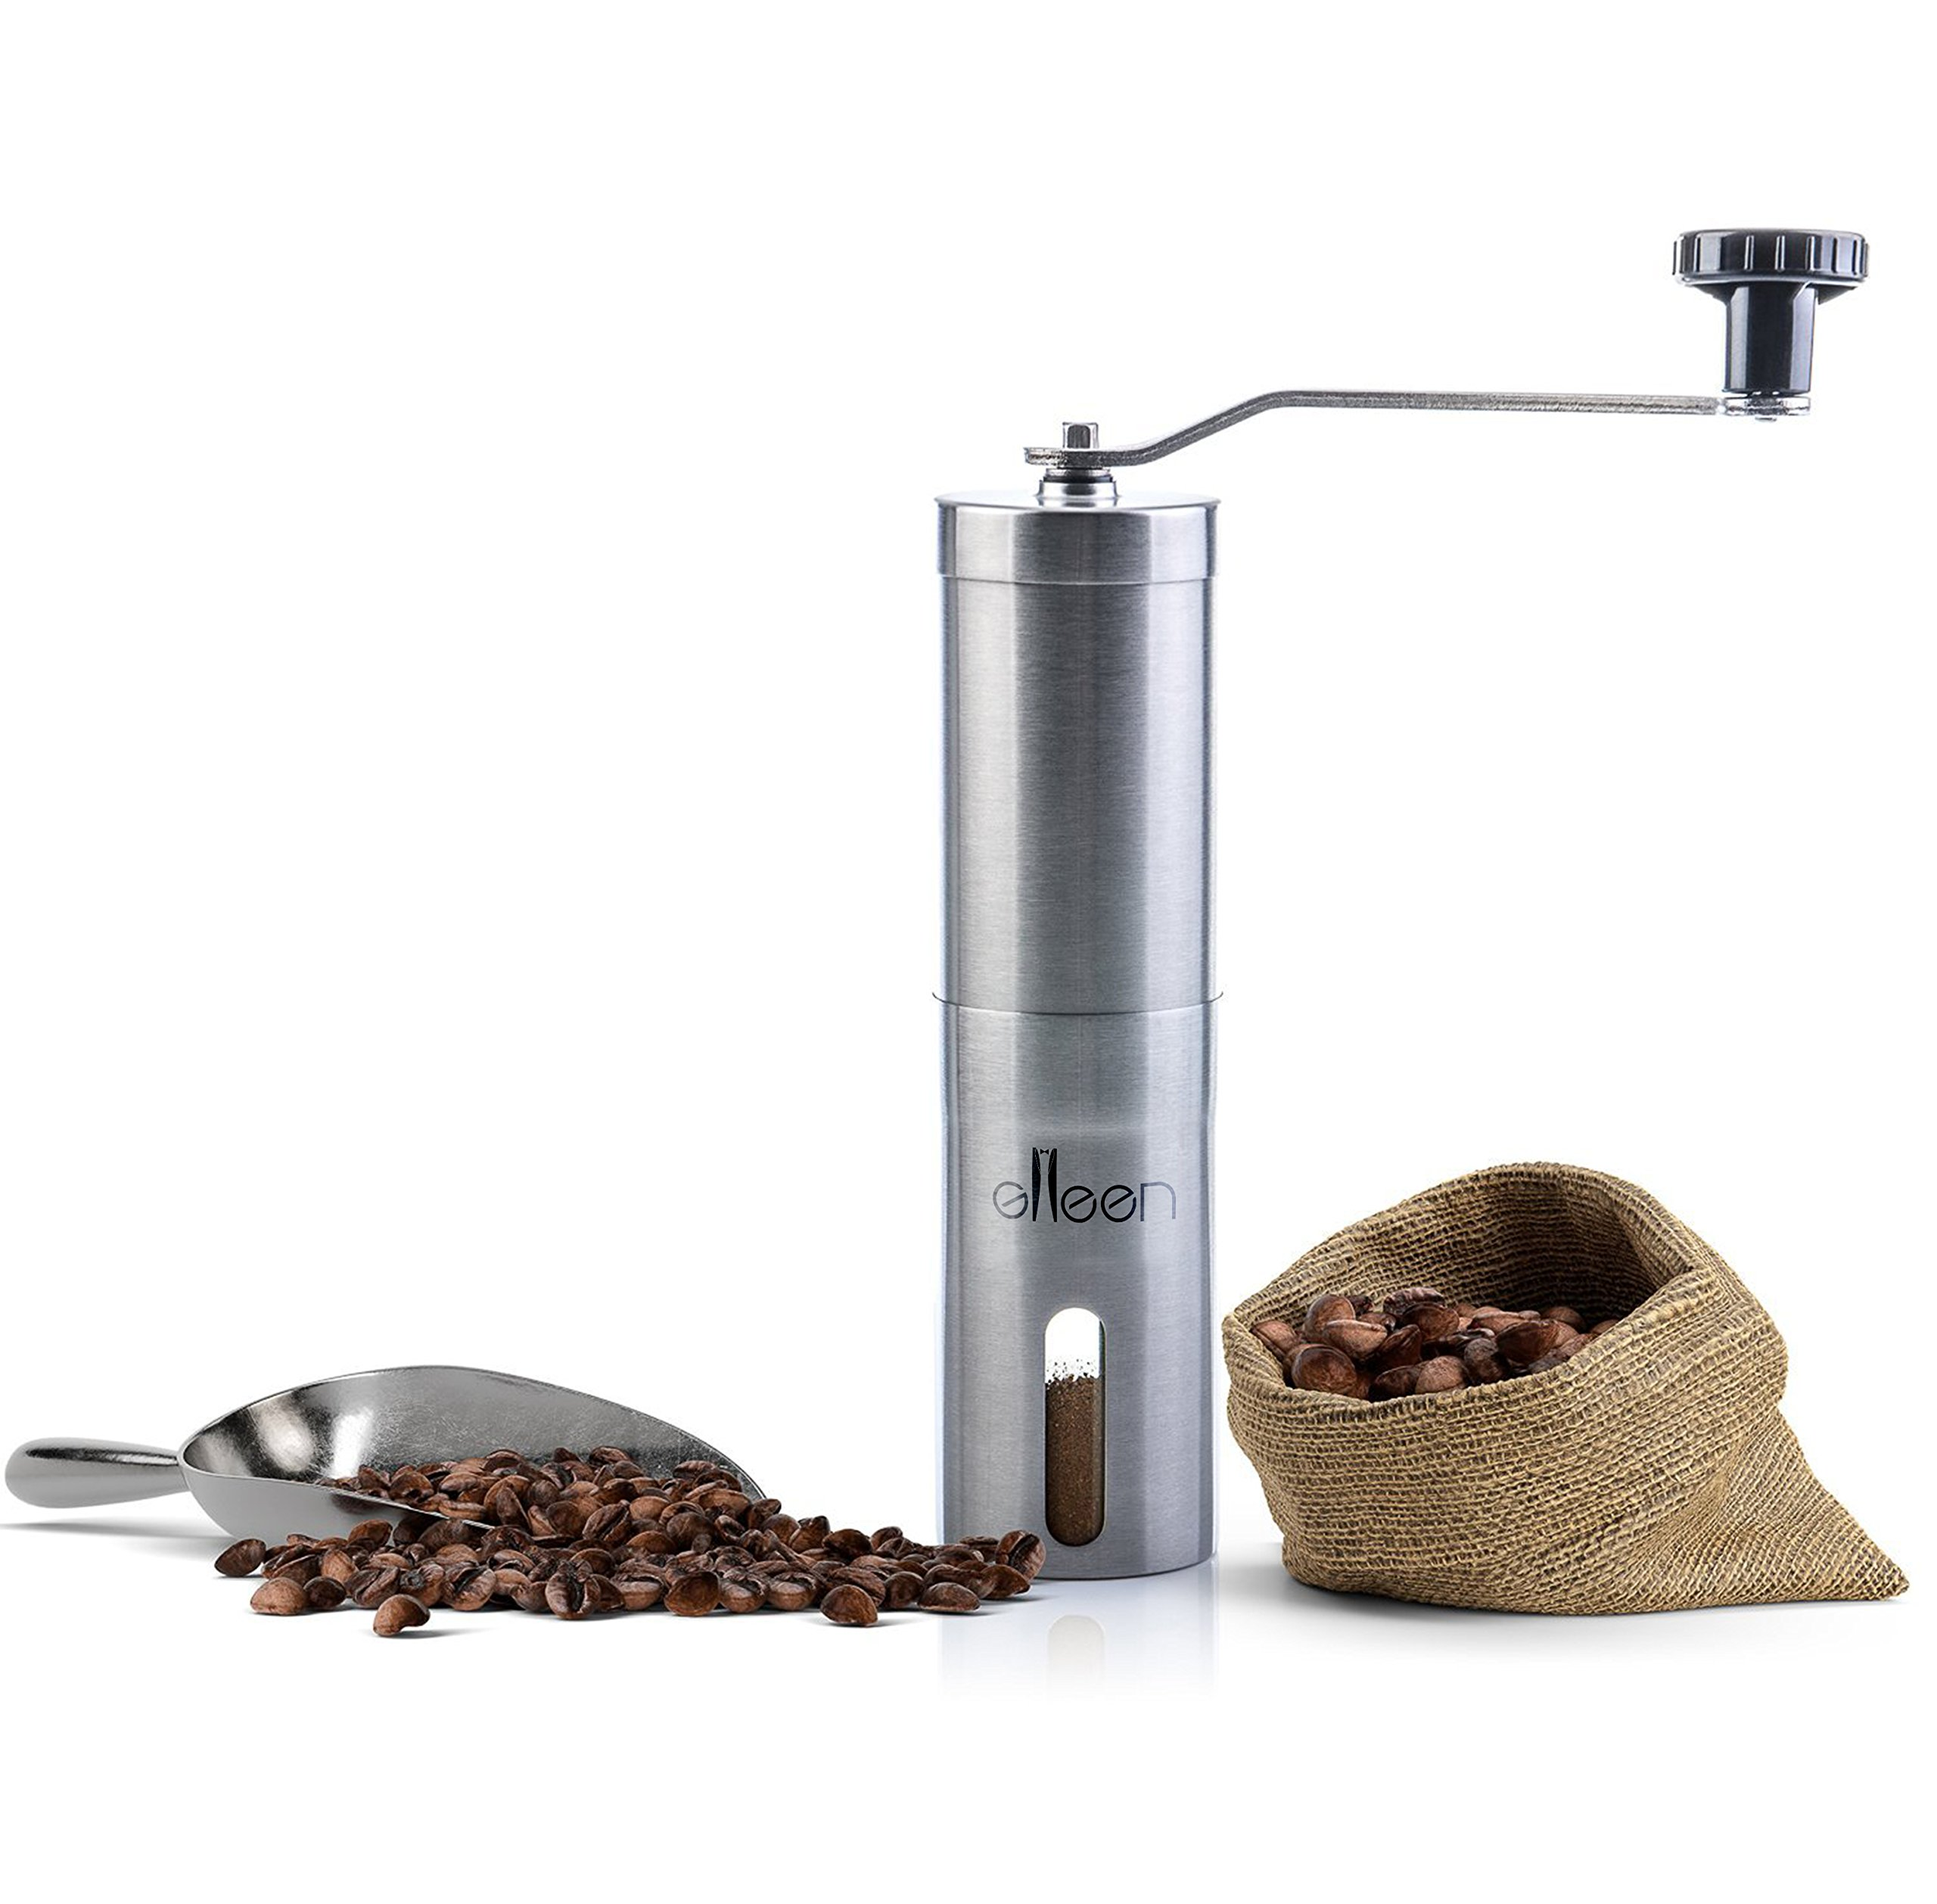 Portable Hand Coffee Grinder, Stainless Steel 18/8, Hand-Rolling Pepper Grinder, Ceramic Grinding Core, Adjustable Nut, Burr Grinder By Glleen